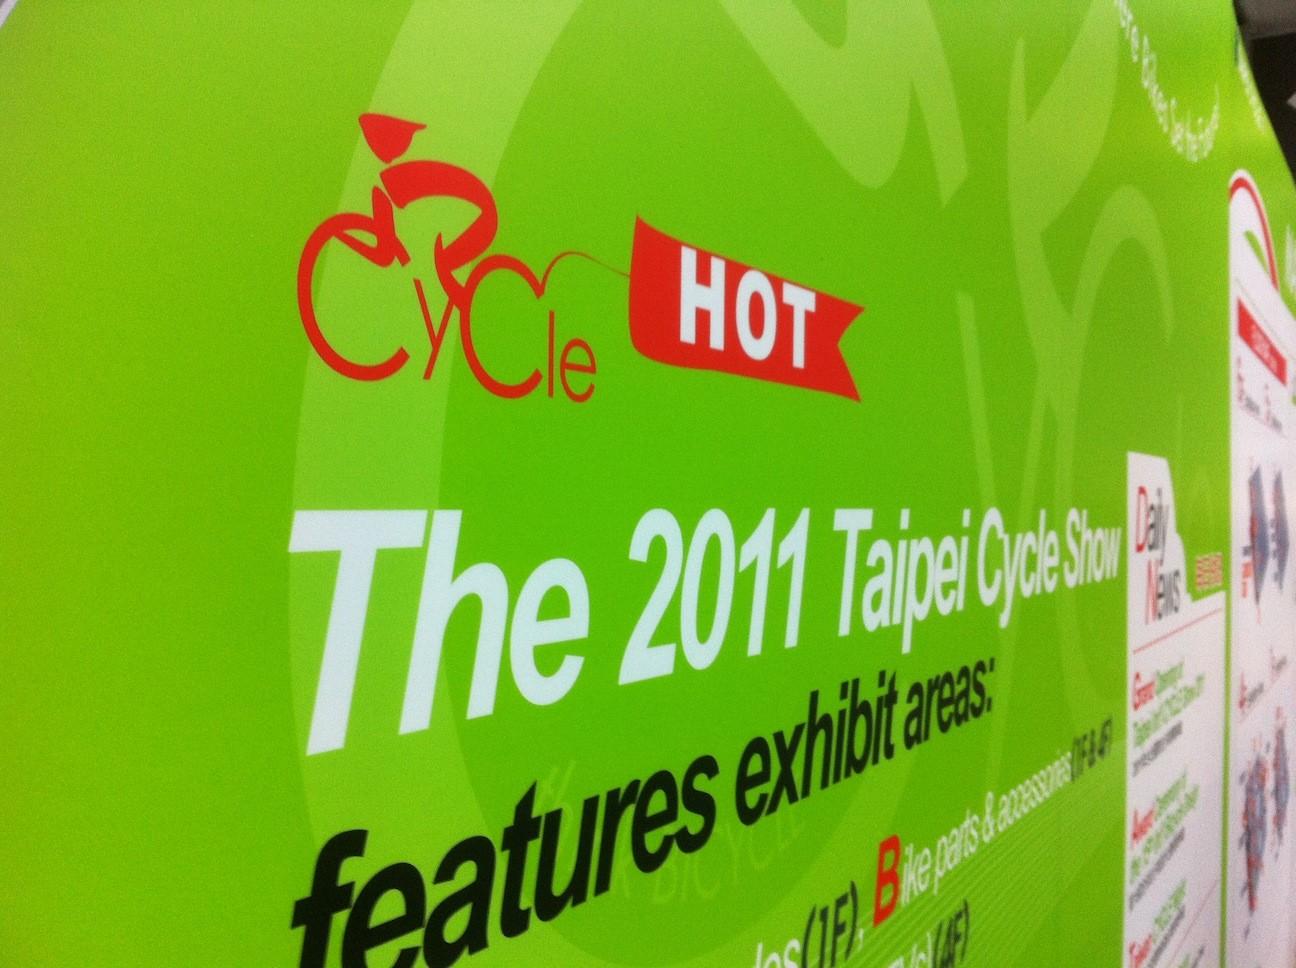 Taipei is HOT! - Taipei, Wacky and Weird - Mountain Biking Pictures - Vital MTB